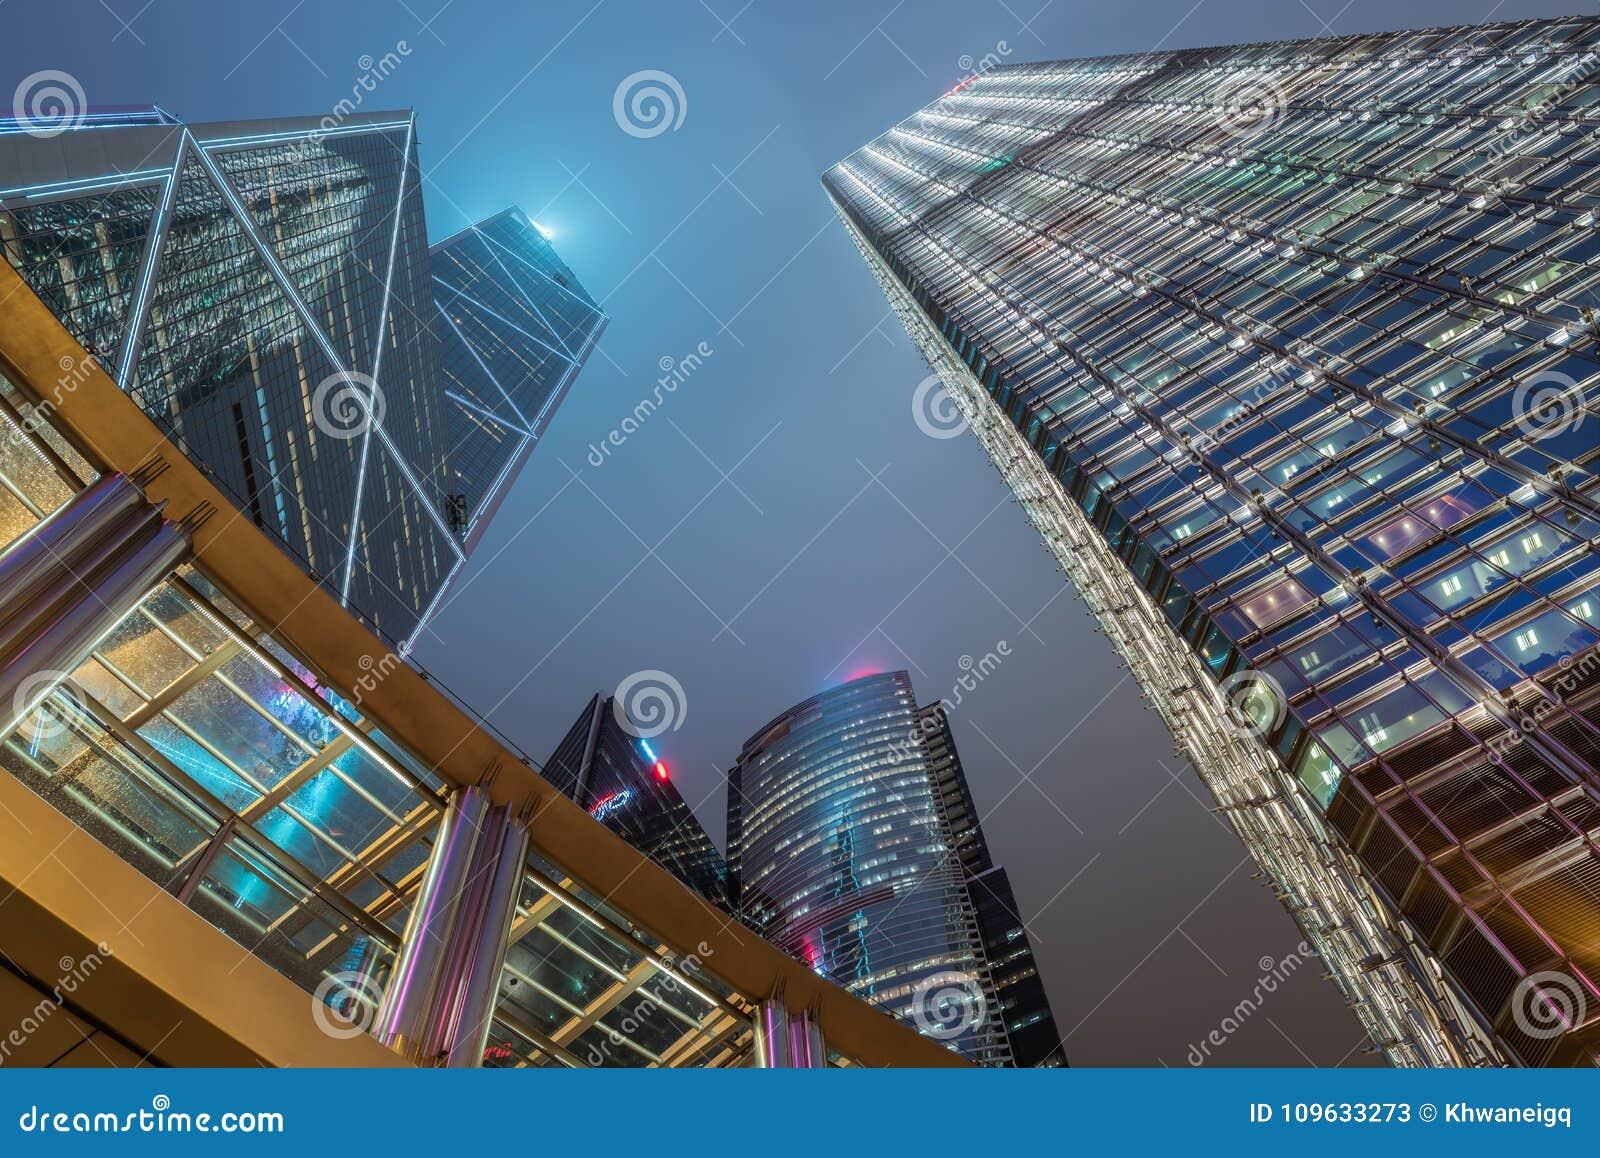 Hong Kong śródmieście i centrum biznesu, Skycraper budynki